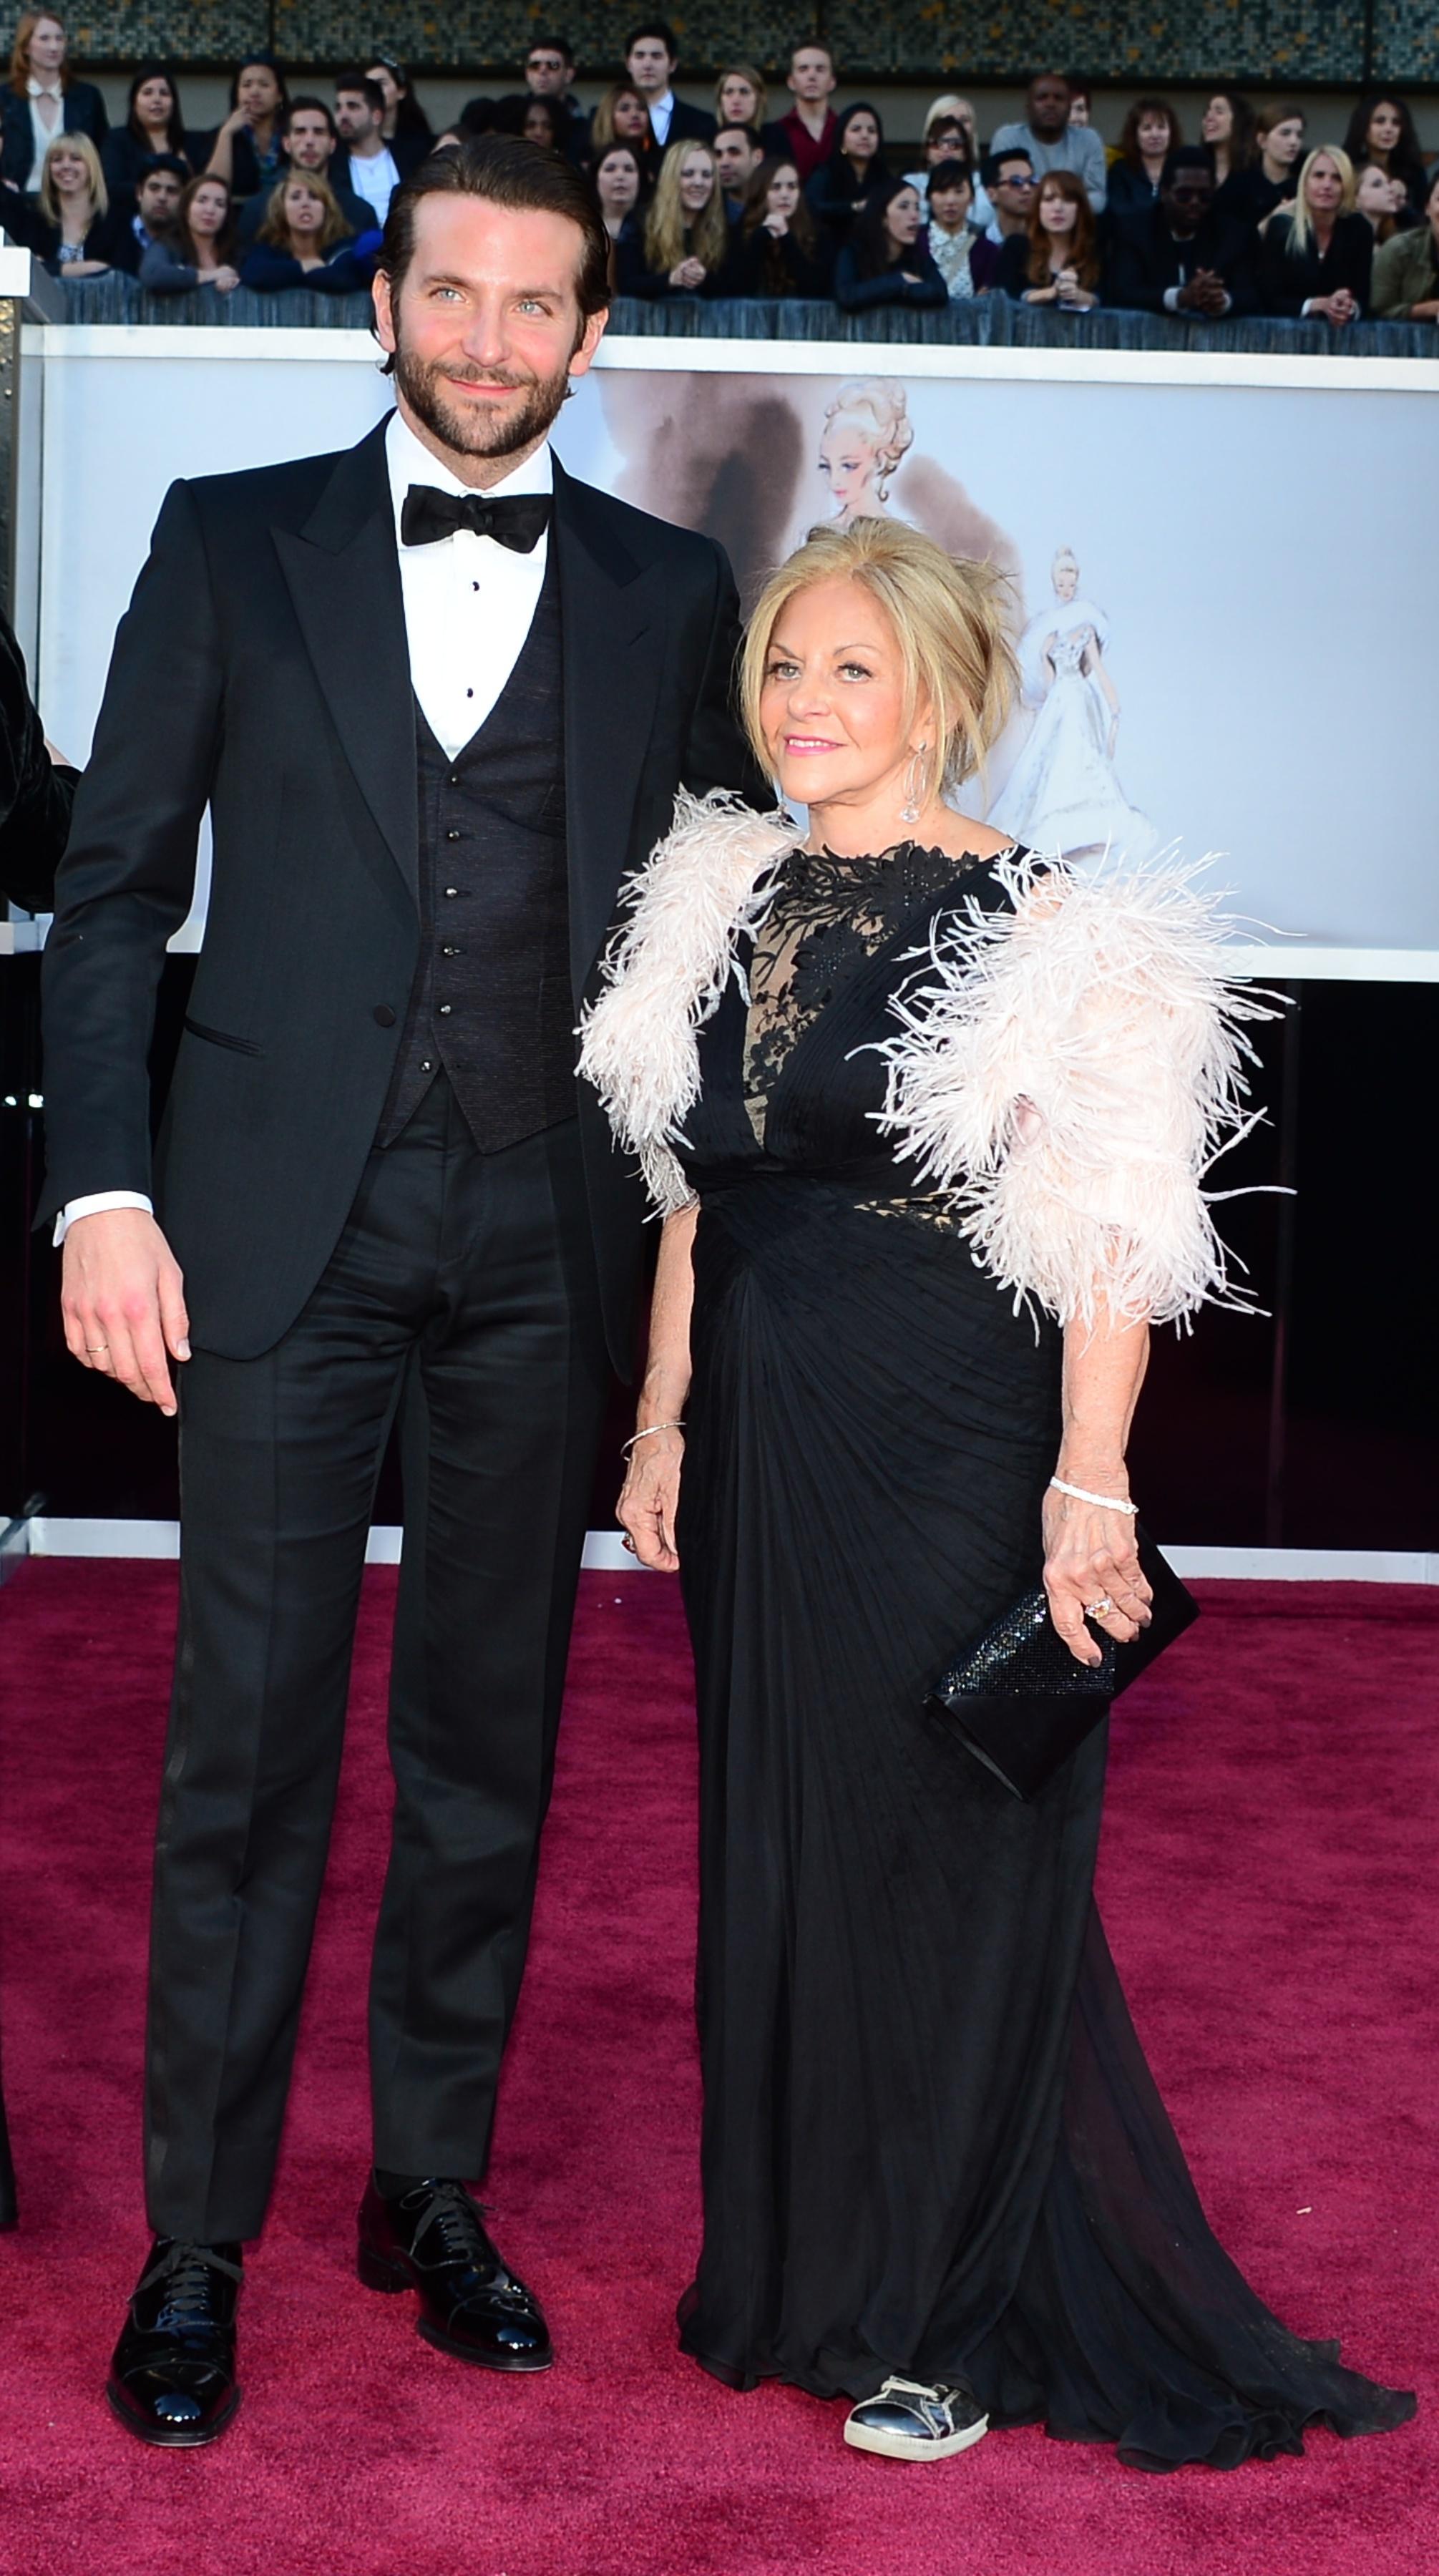 Bradley Cooper 2013 oscars academy awards